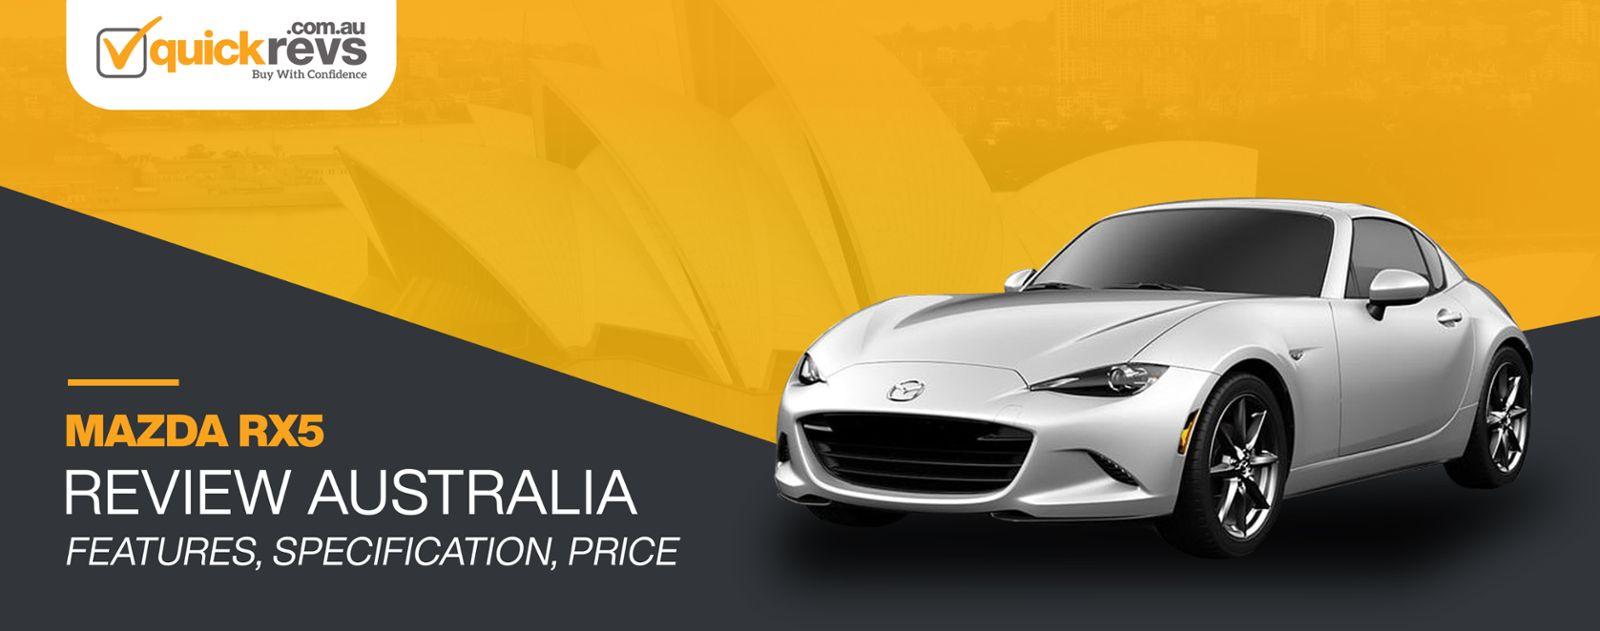 Mazda RX5 Review Australia